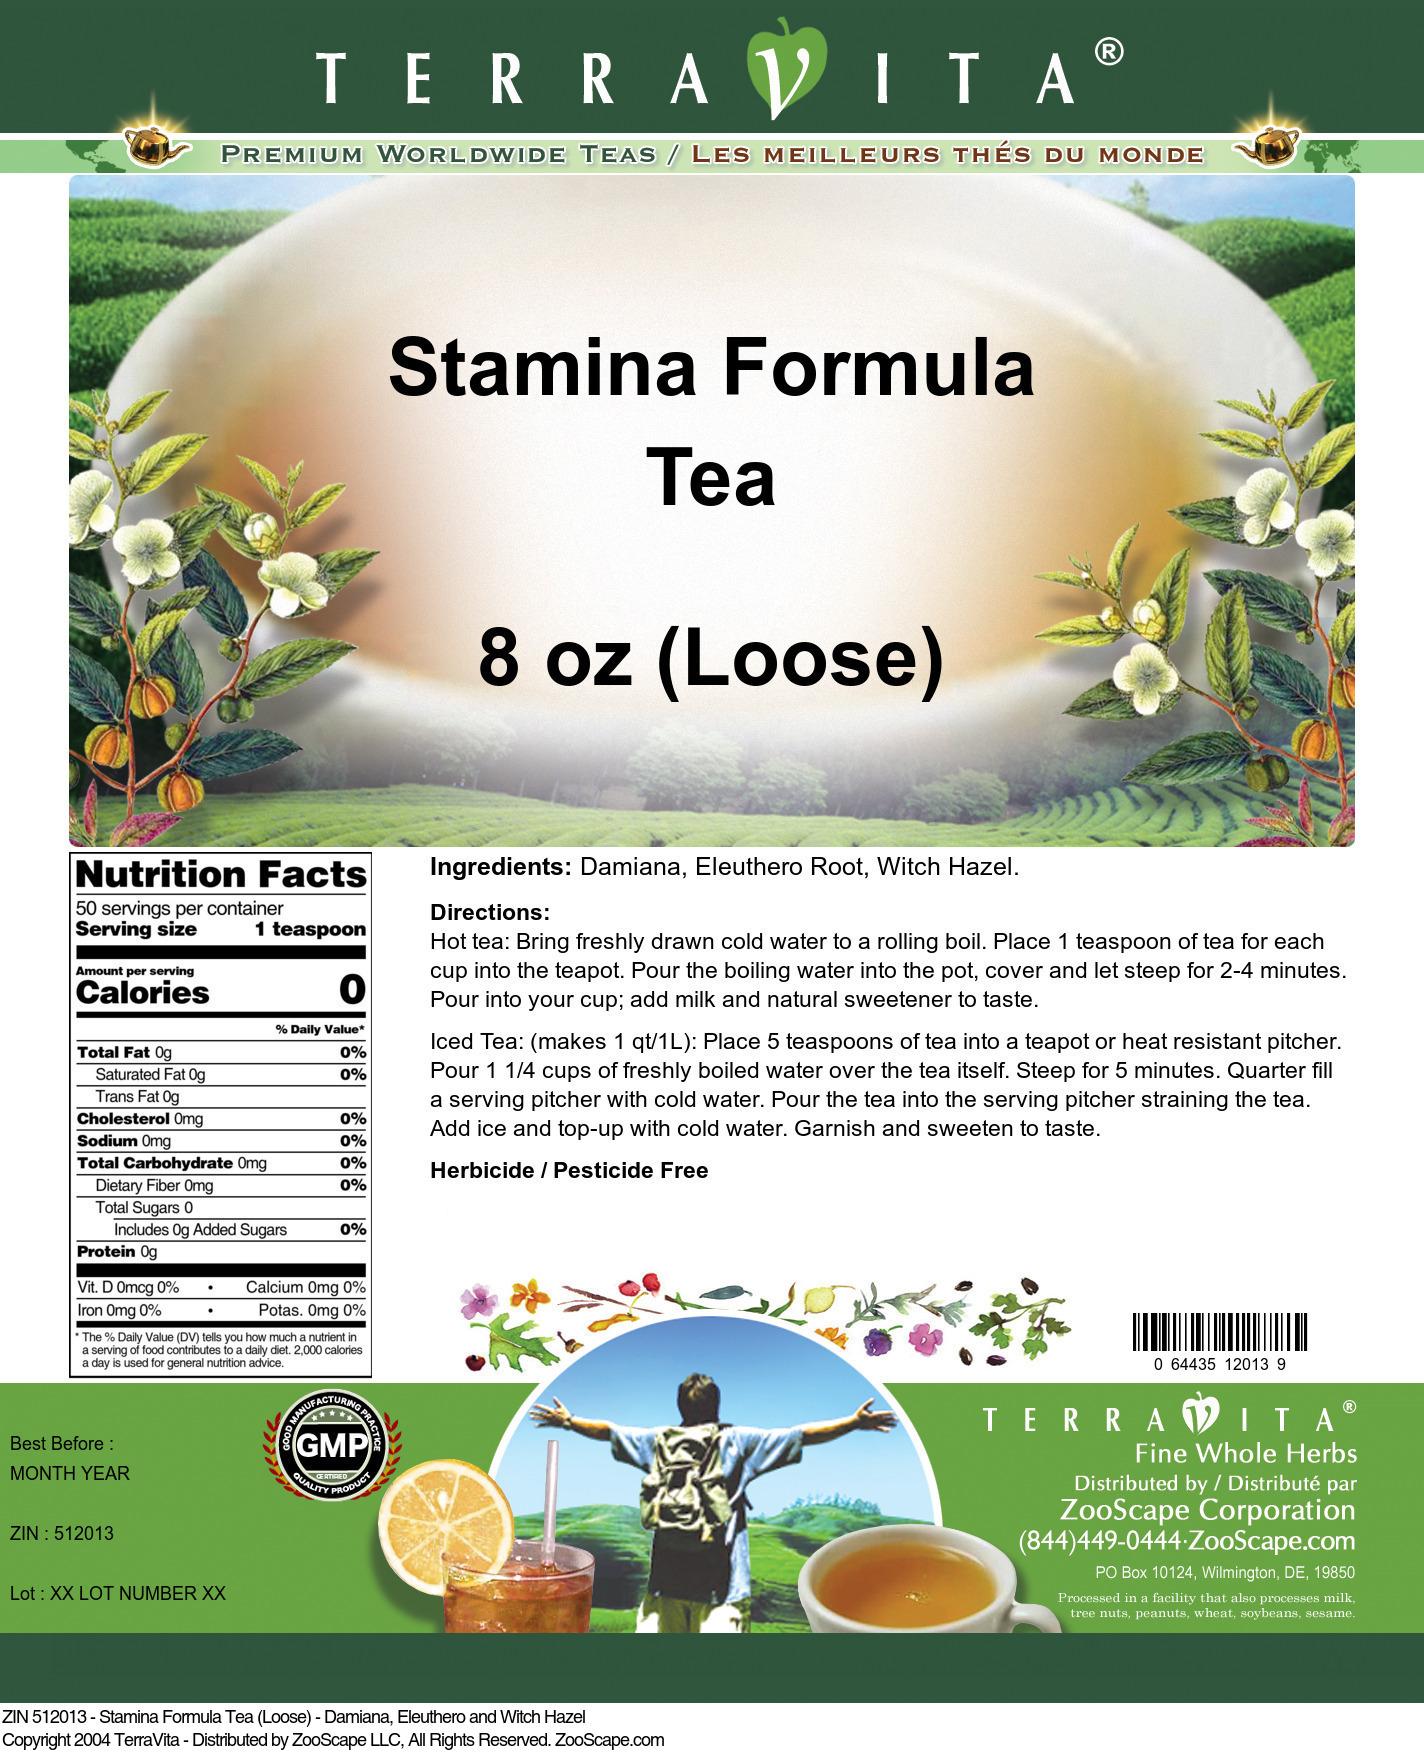 Stamina Formula Tea (Loose) - Damiana, Eleuthero and Witch Hazel